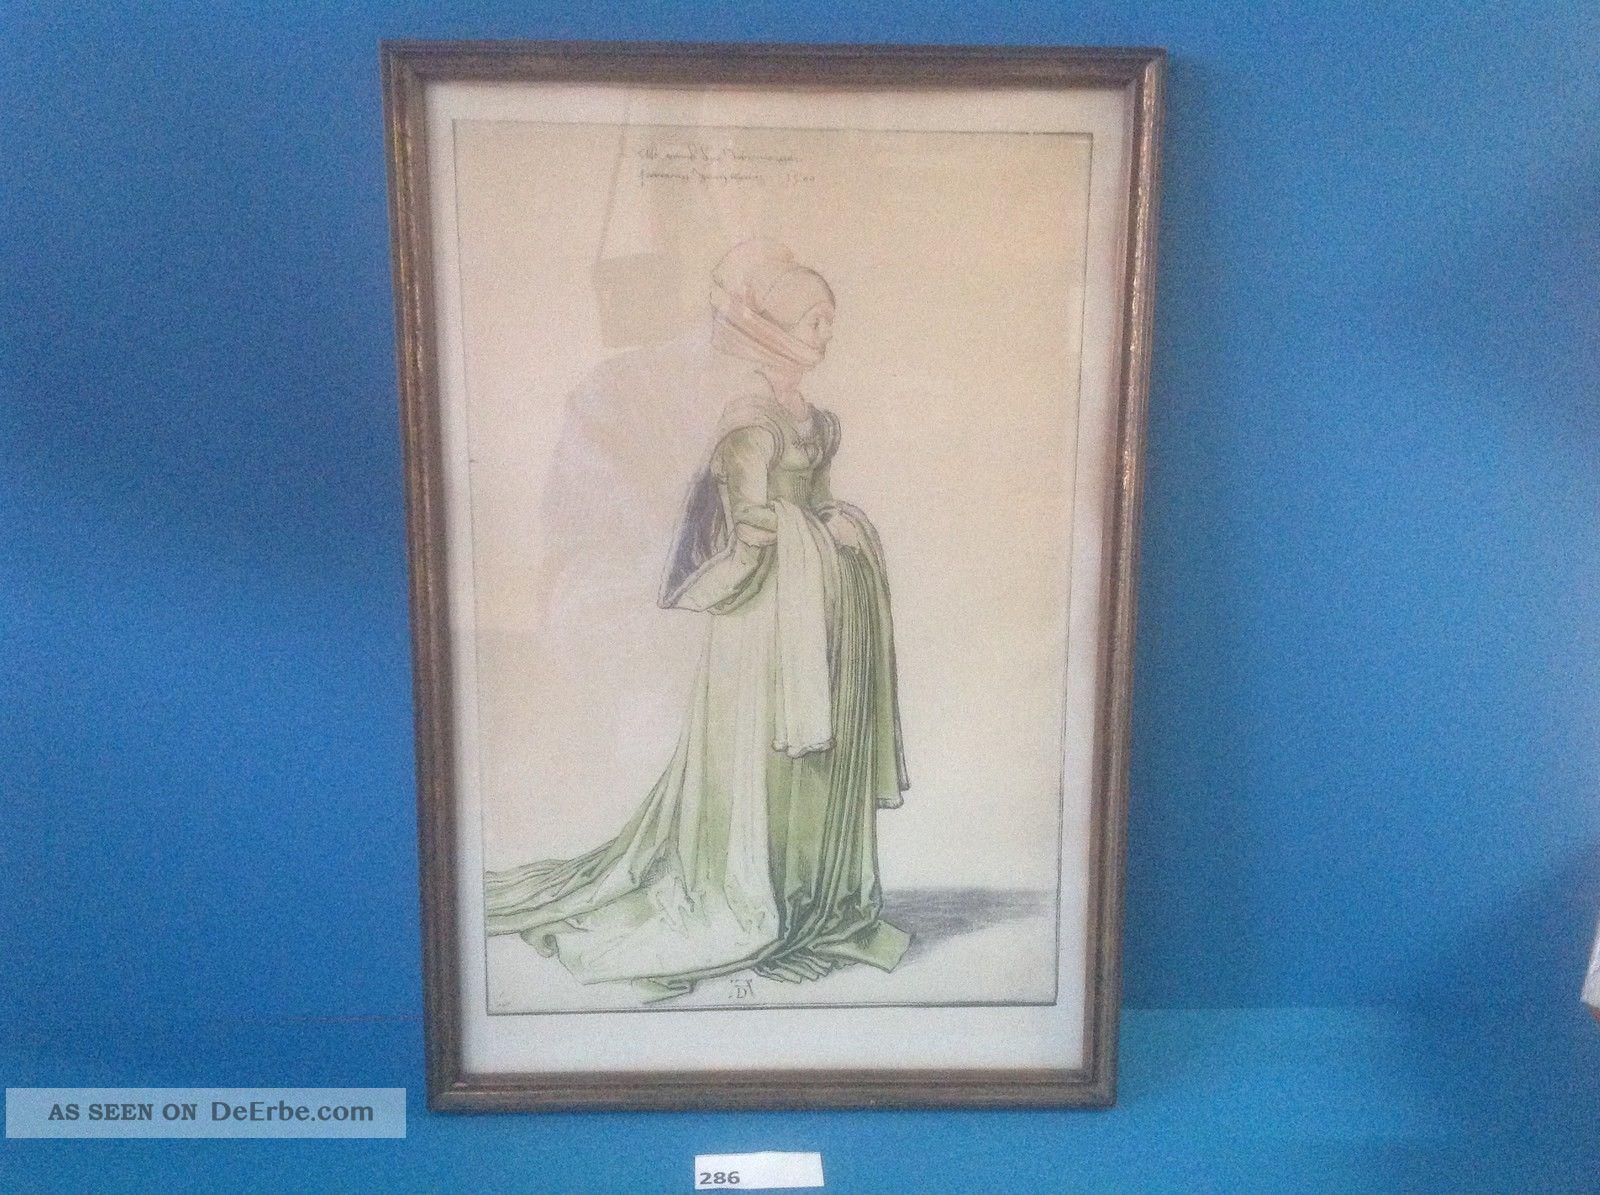 Colorierte Zeichnung,  Albrecht Dürer,  Damenmode Um 1500,  Holzrahmen (286) 1890-1919, Jugendstil Bild